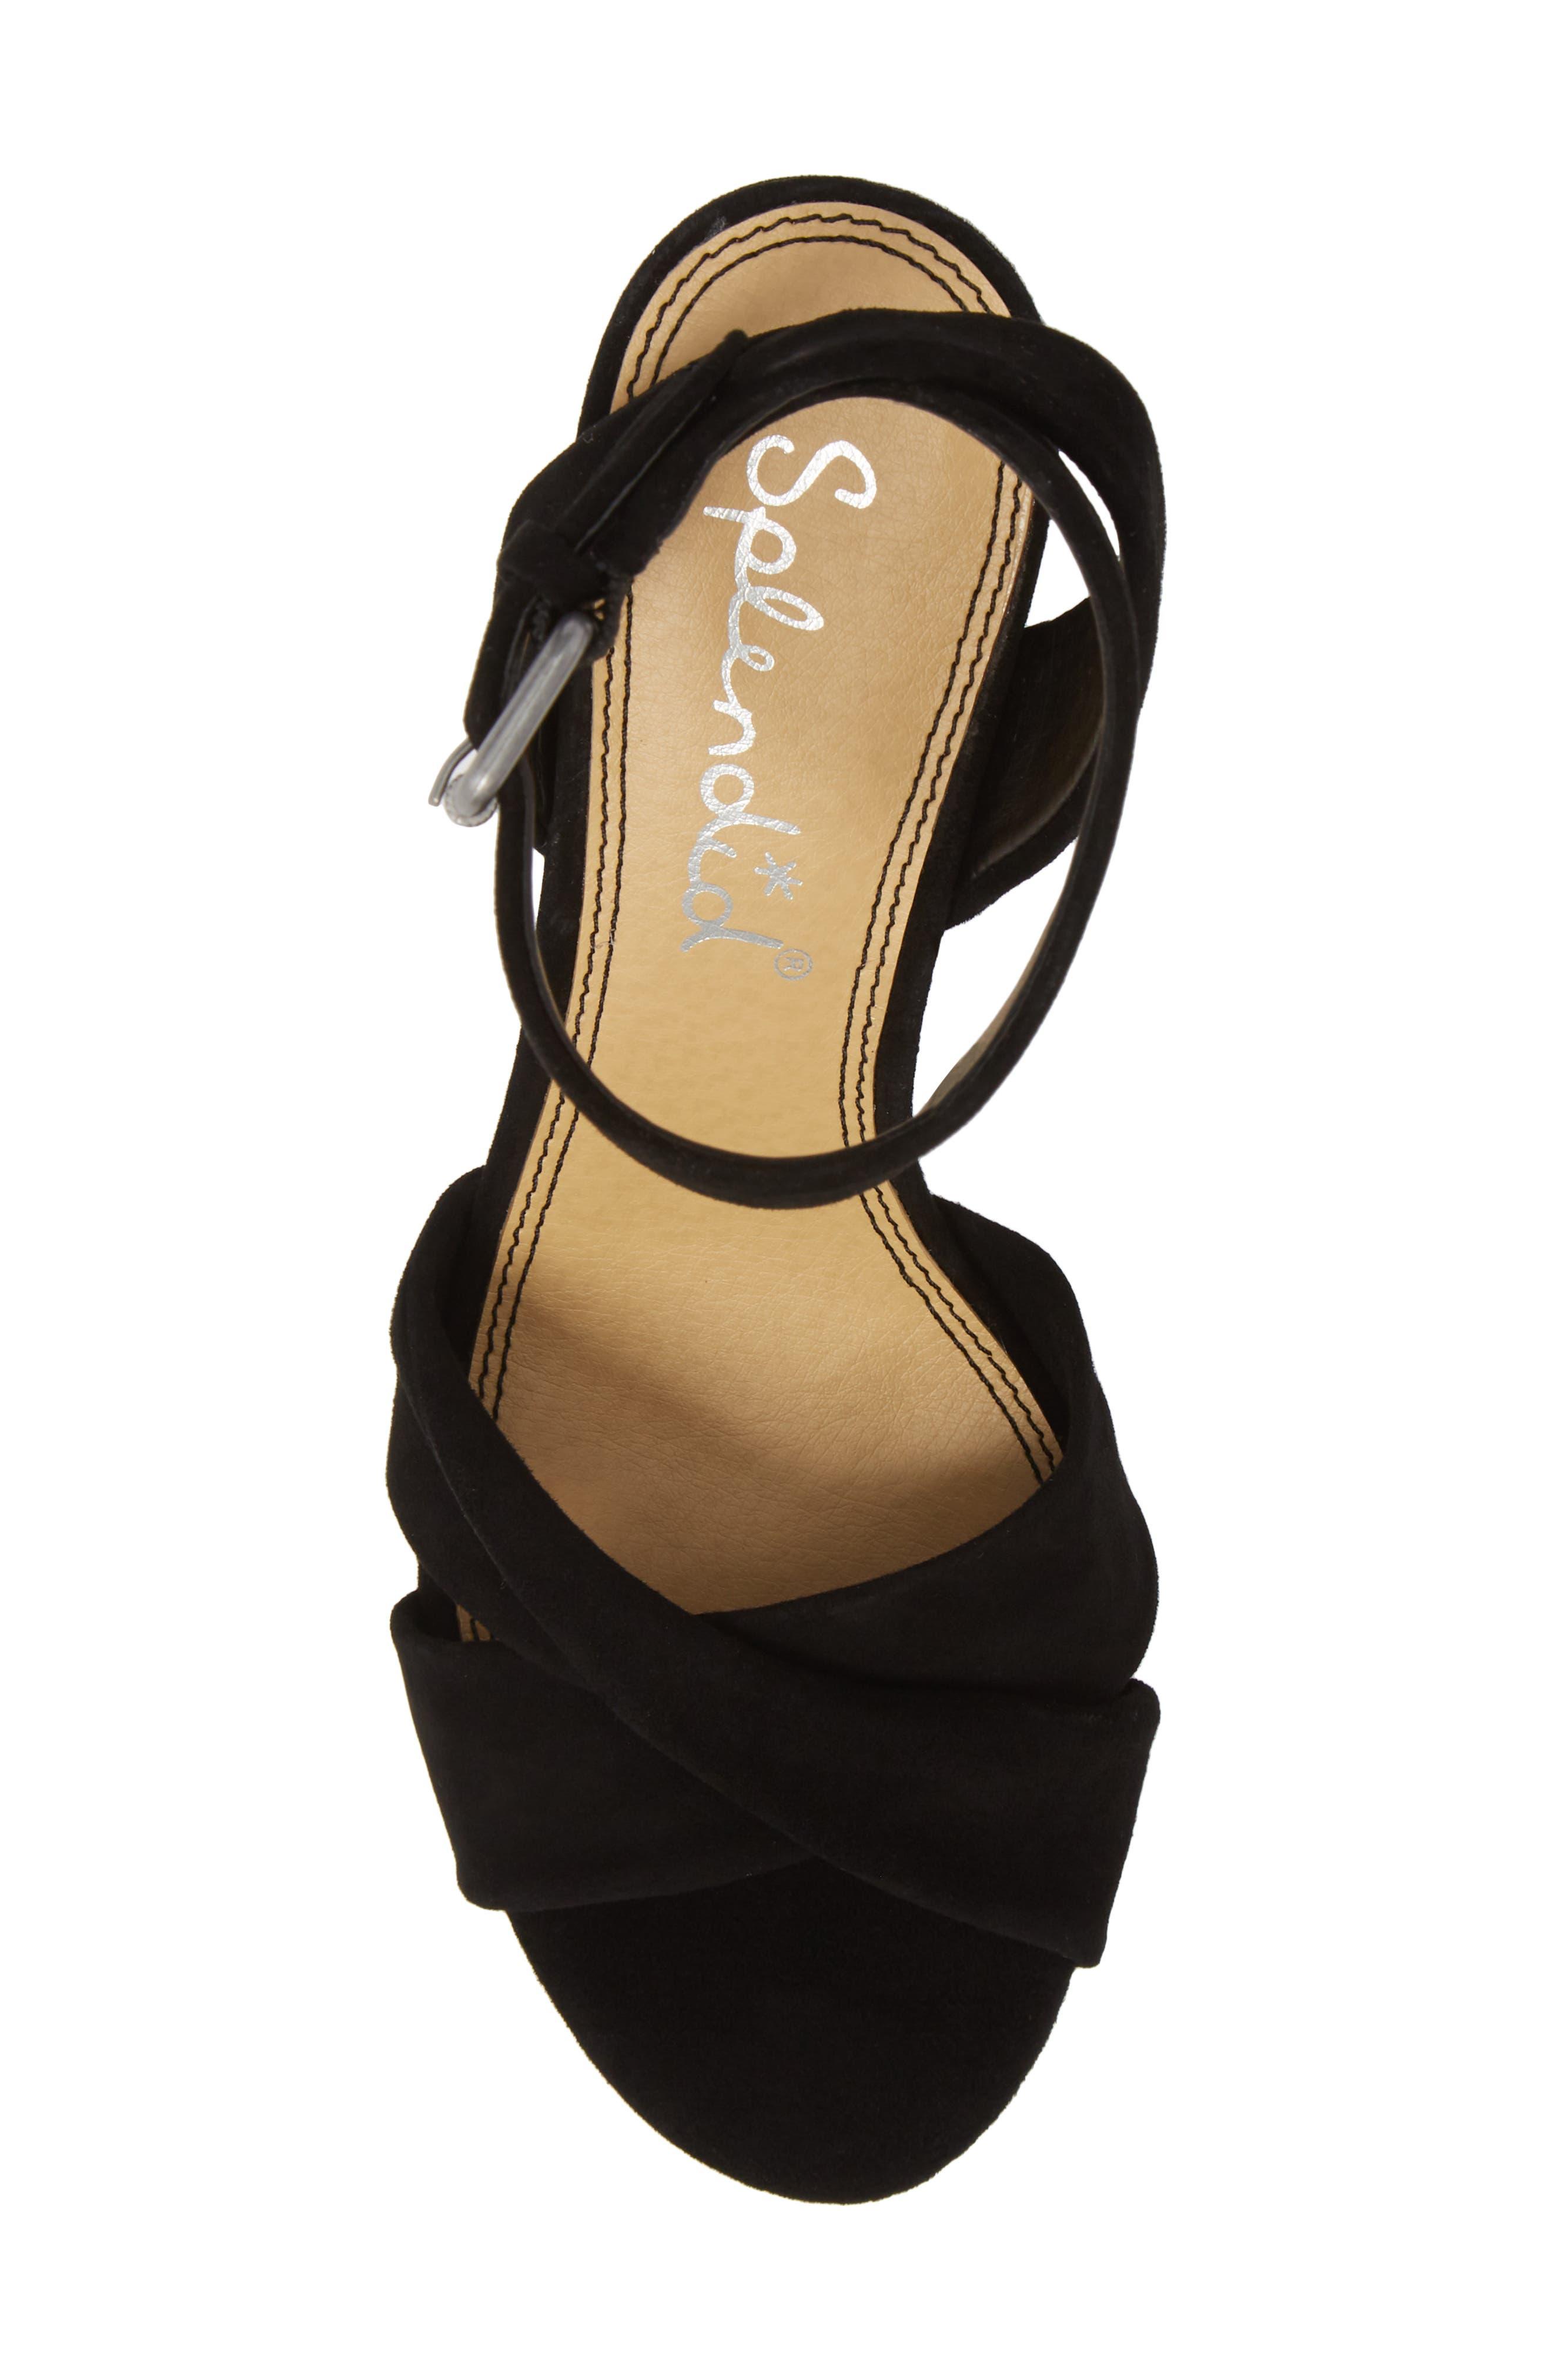 Fairy Block Heel Sandal,                             Alternate thumbnail 5, color,                             Black Suede